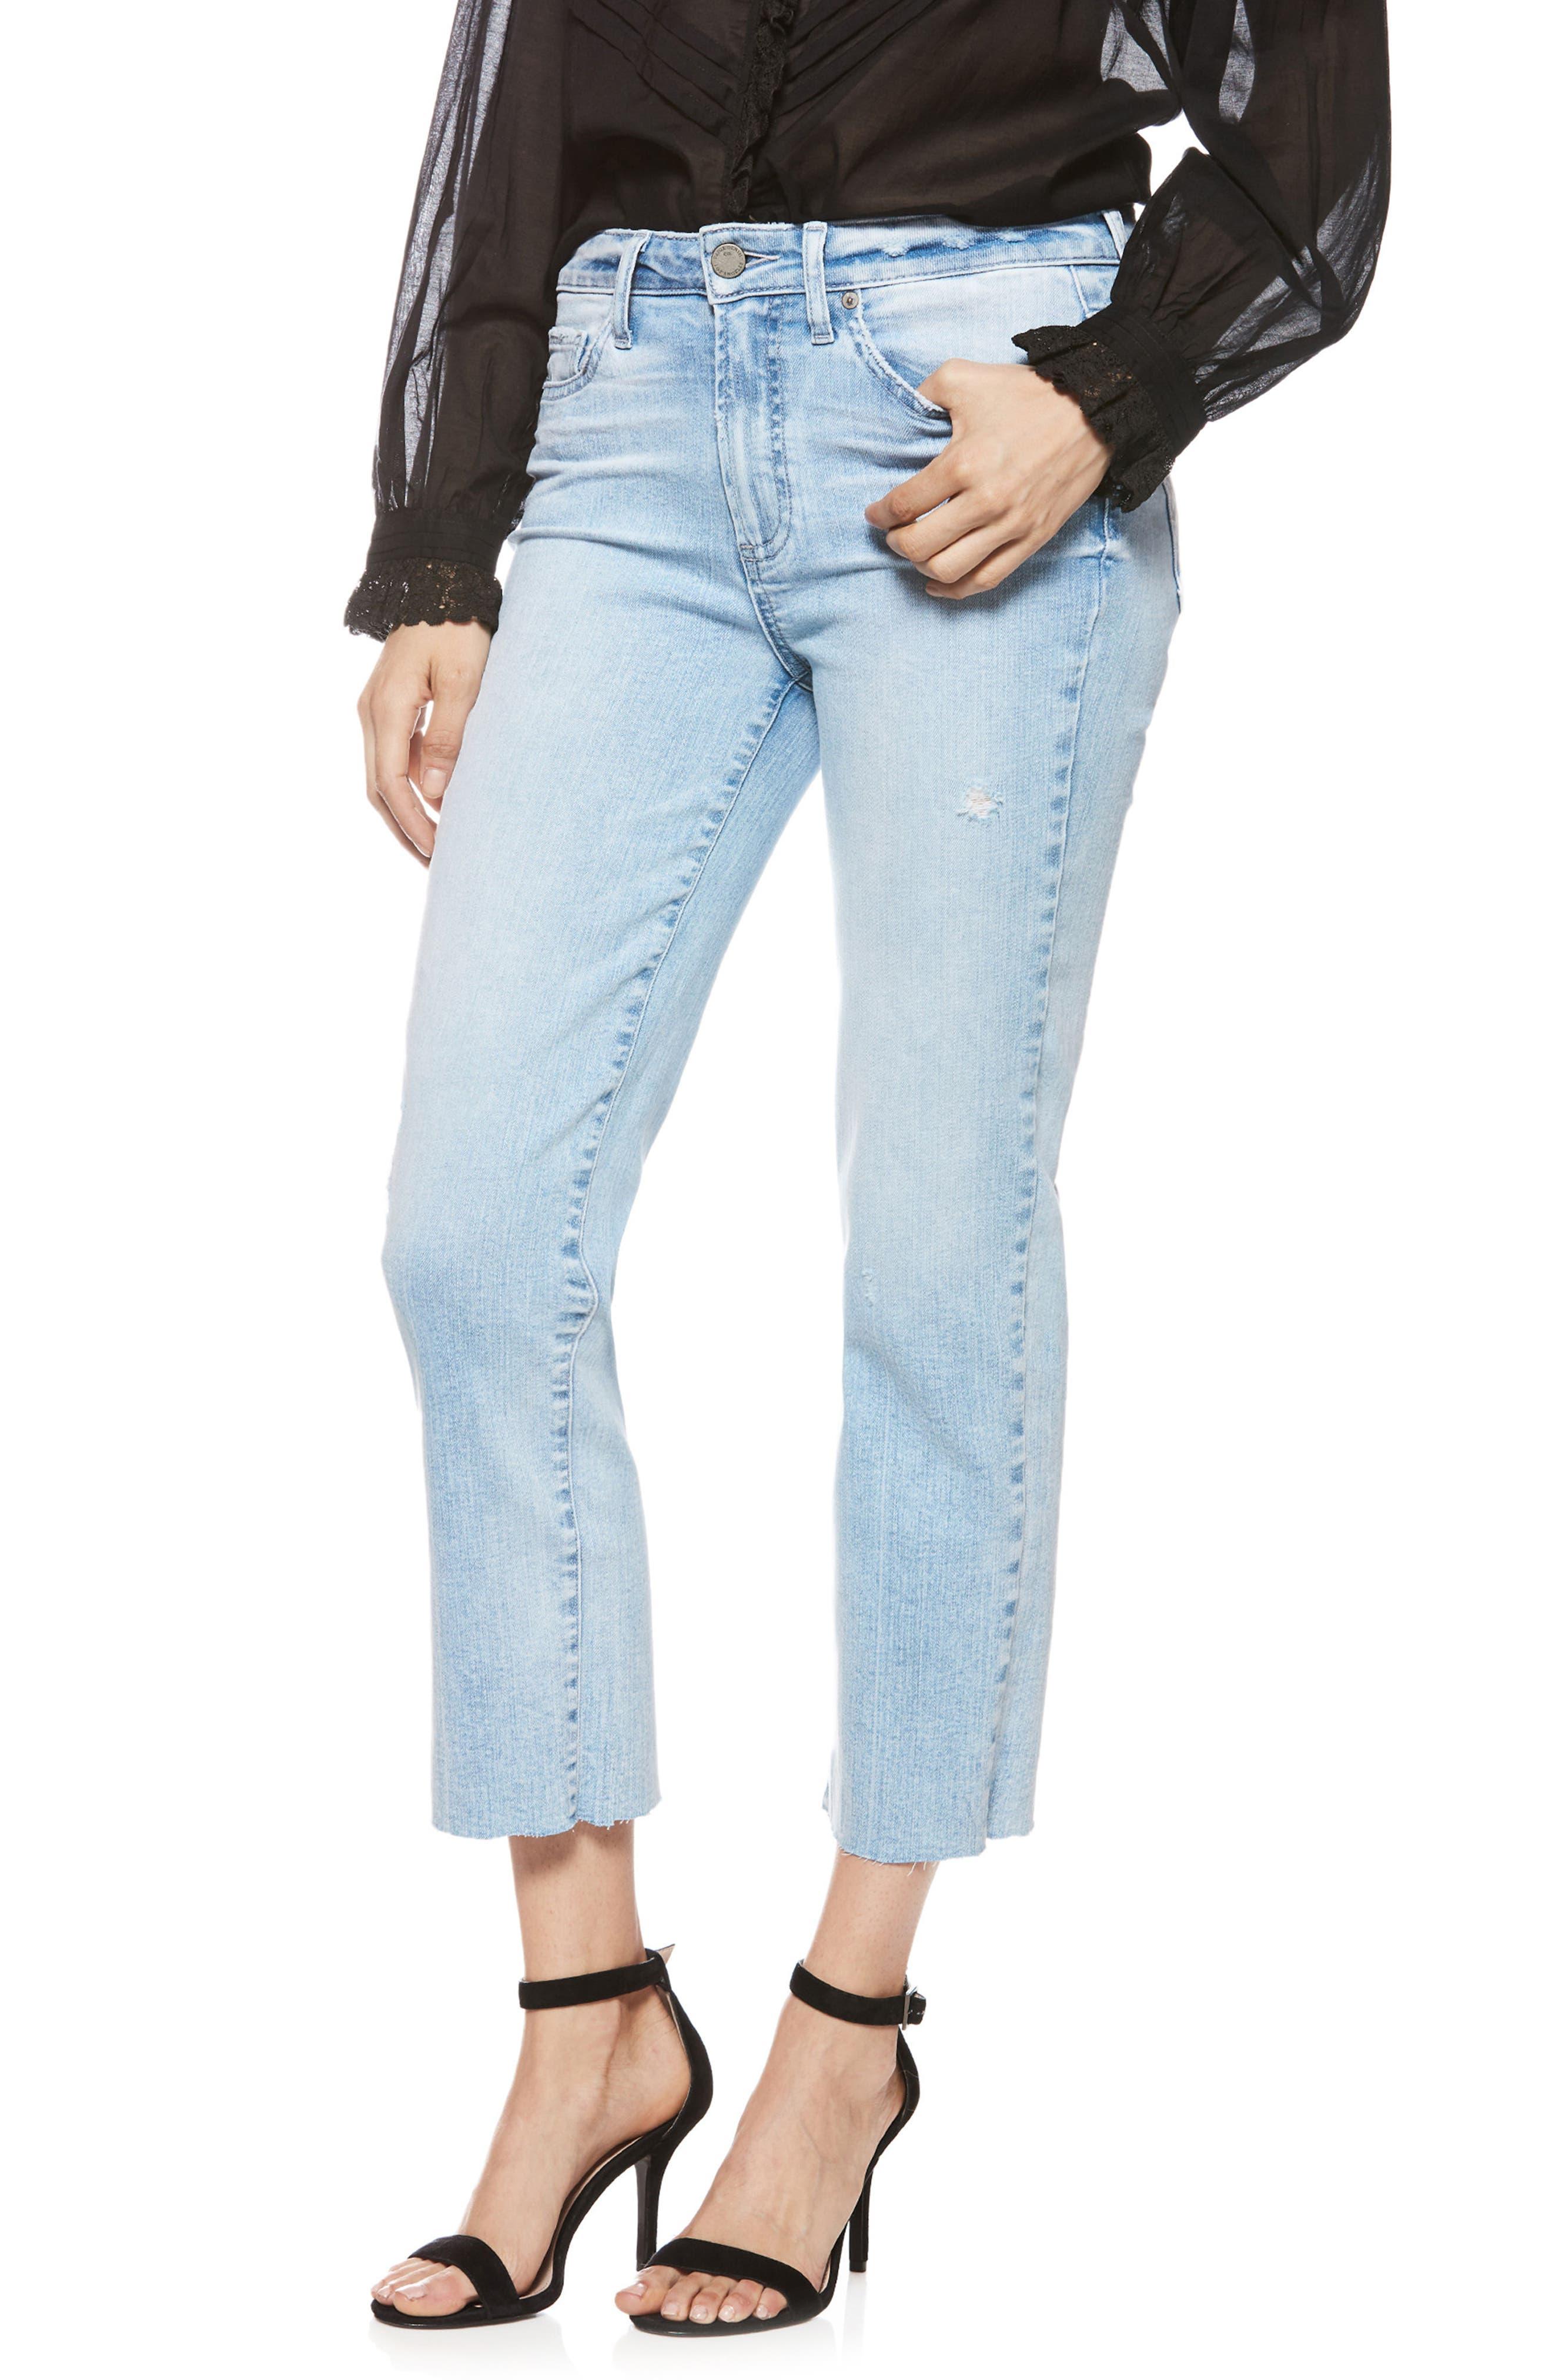 Hoxton High Waist Crop Straight Leg Jeans,                             Main thumbnail 1, color,                             Pasadena W/ Wash Crease